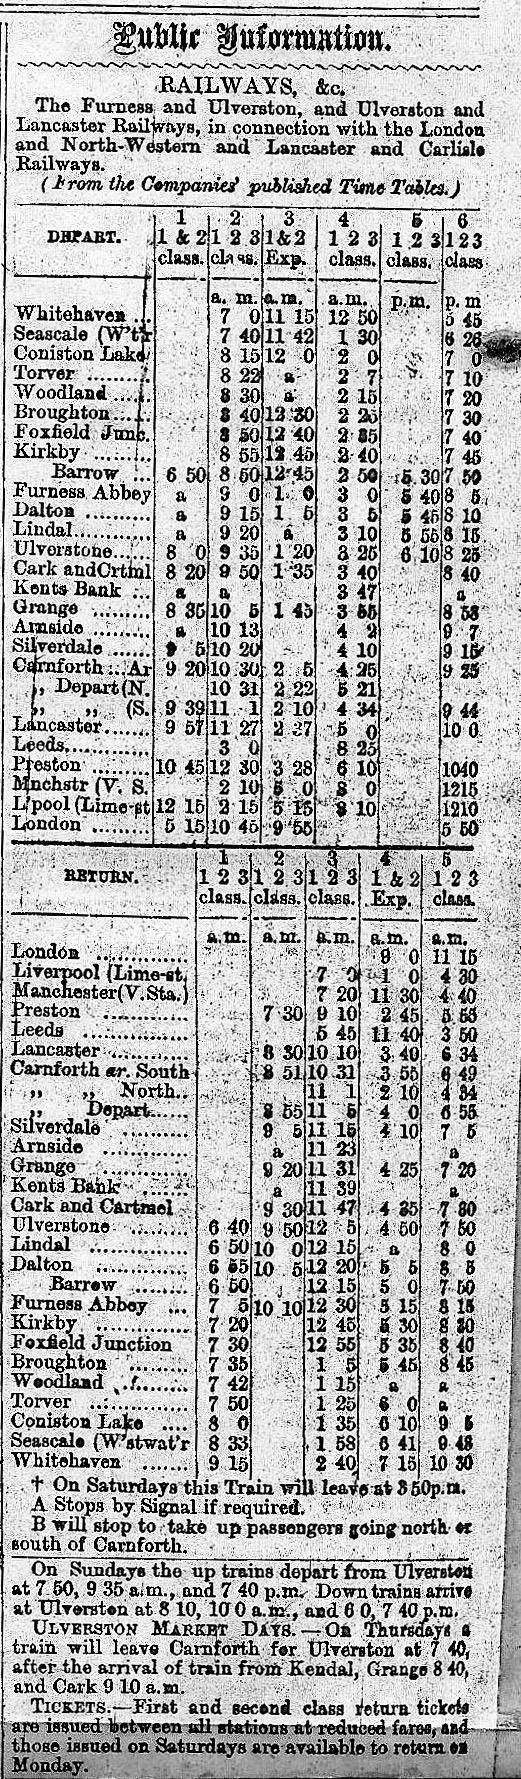 Ulverston Mirror 1862 Extract1